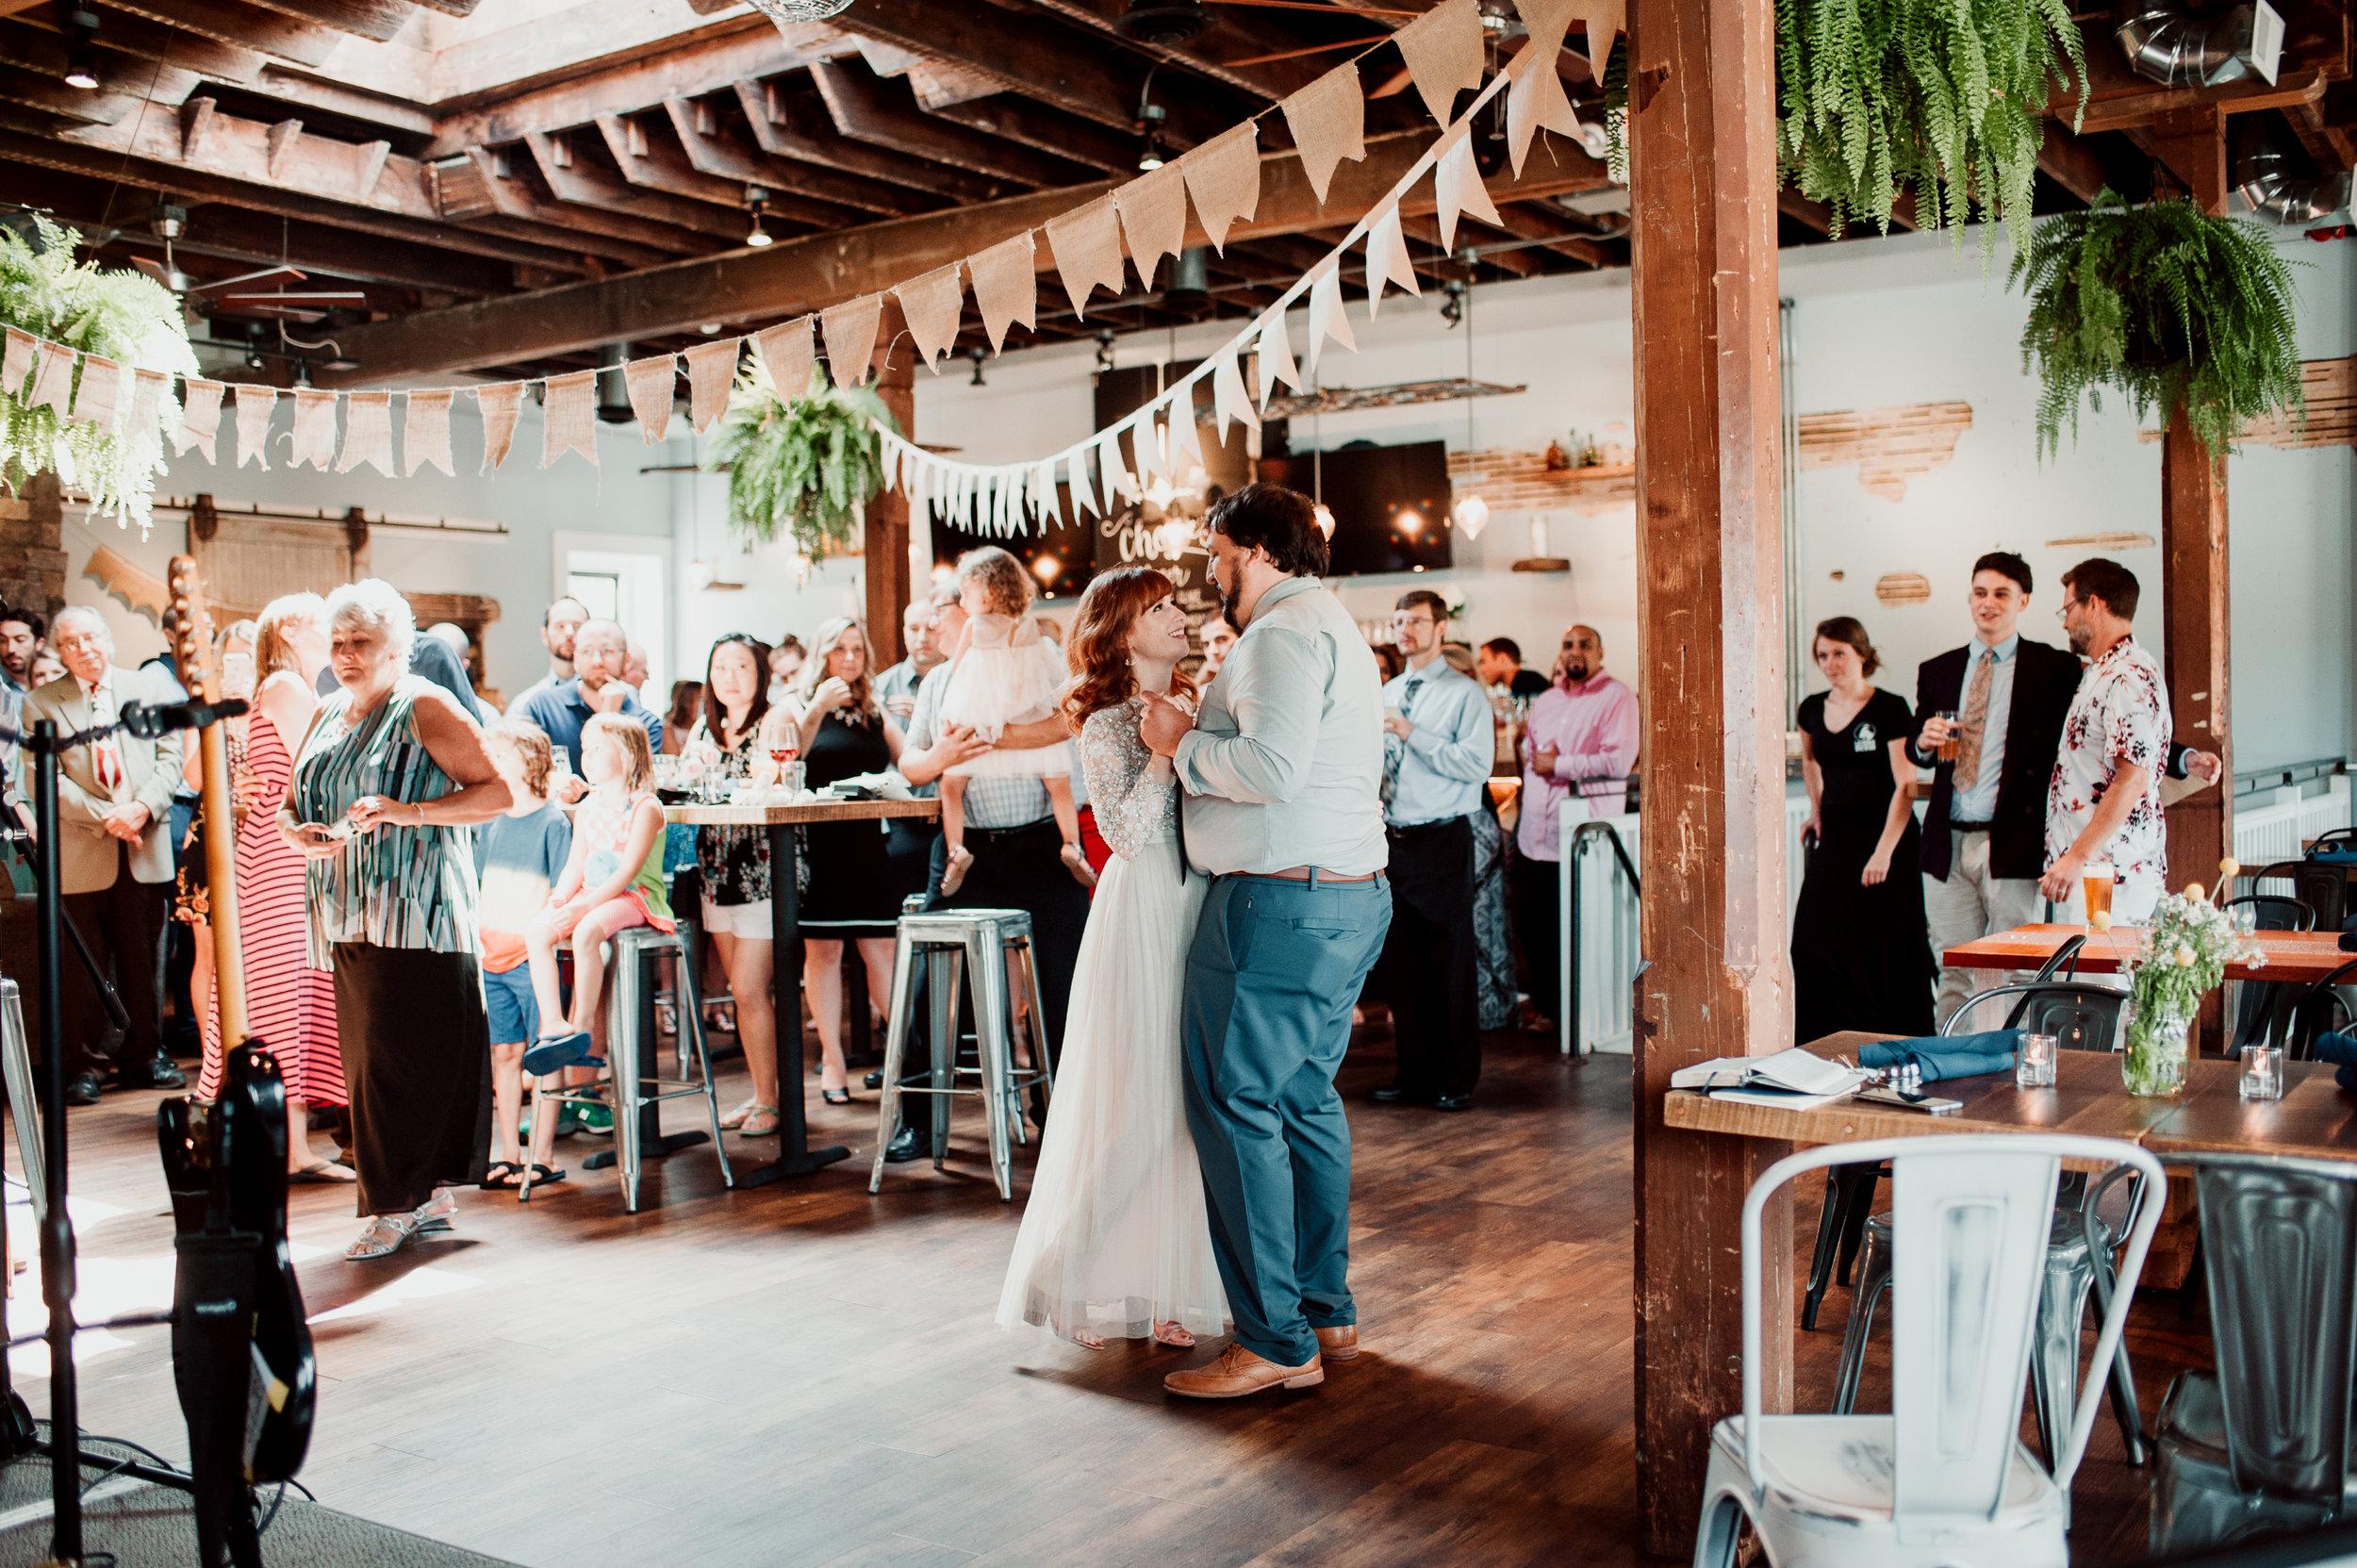 Philadelphia-wedding-photographer-la-cabra-brewery-diy-Peaberry-Photography-040.jpg